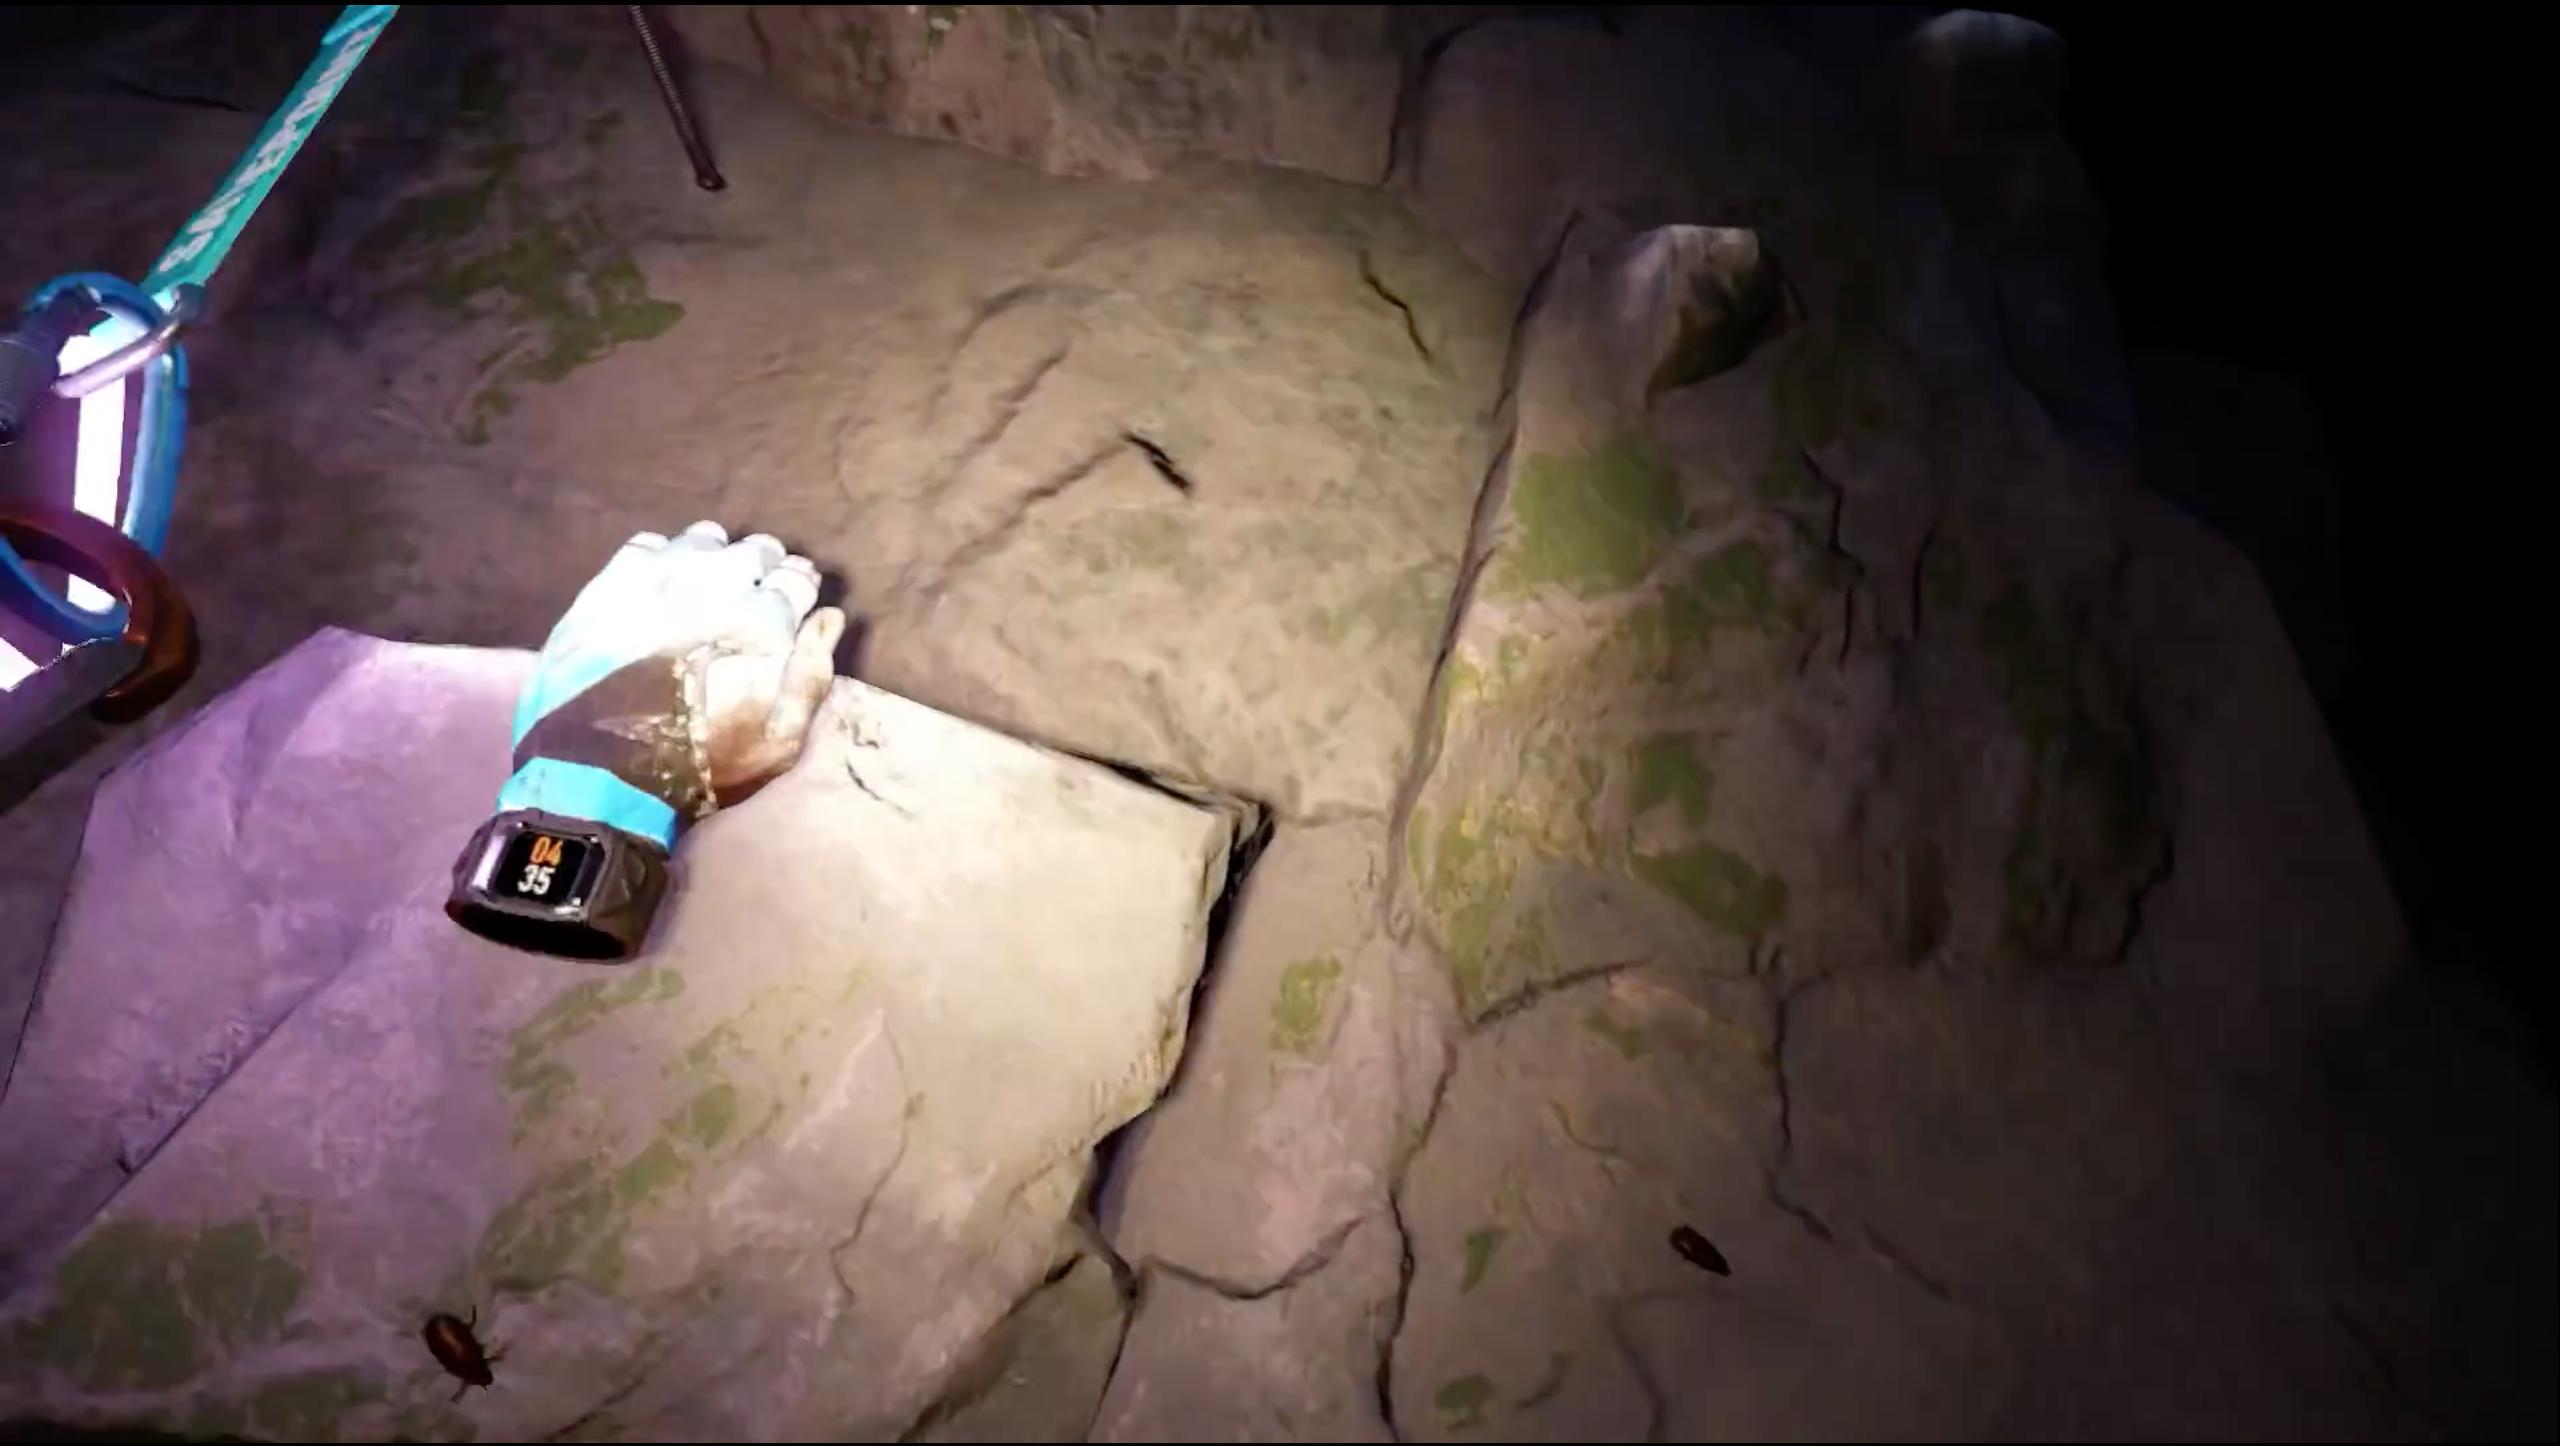 THE CLIMB Launch Trailer (Oculus Rift - VR Game)